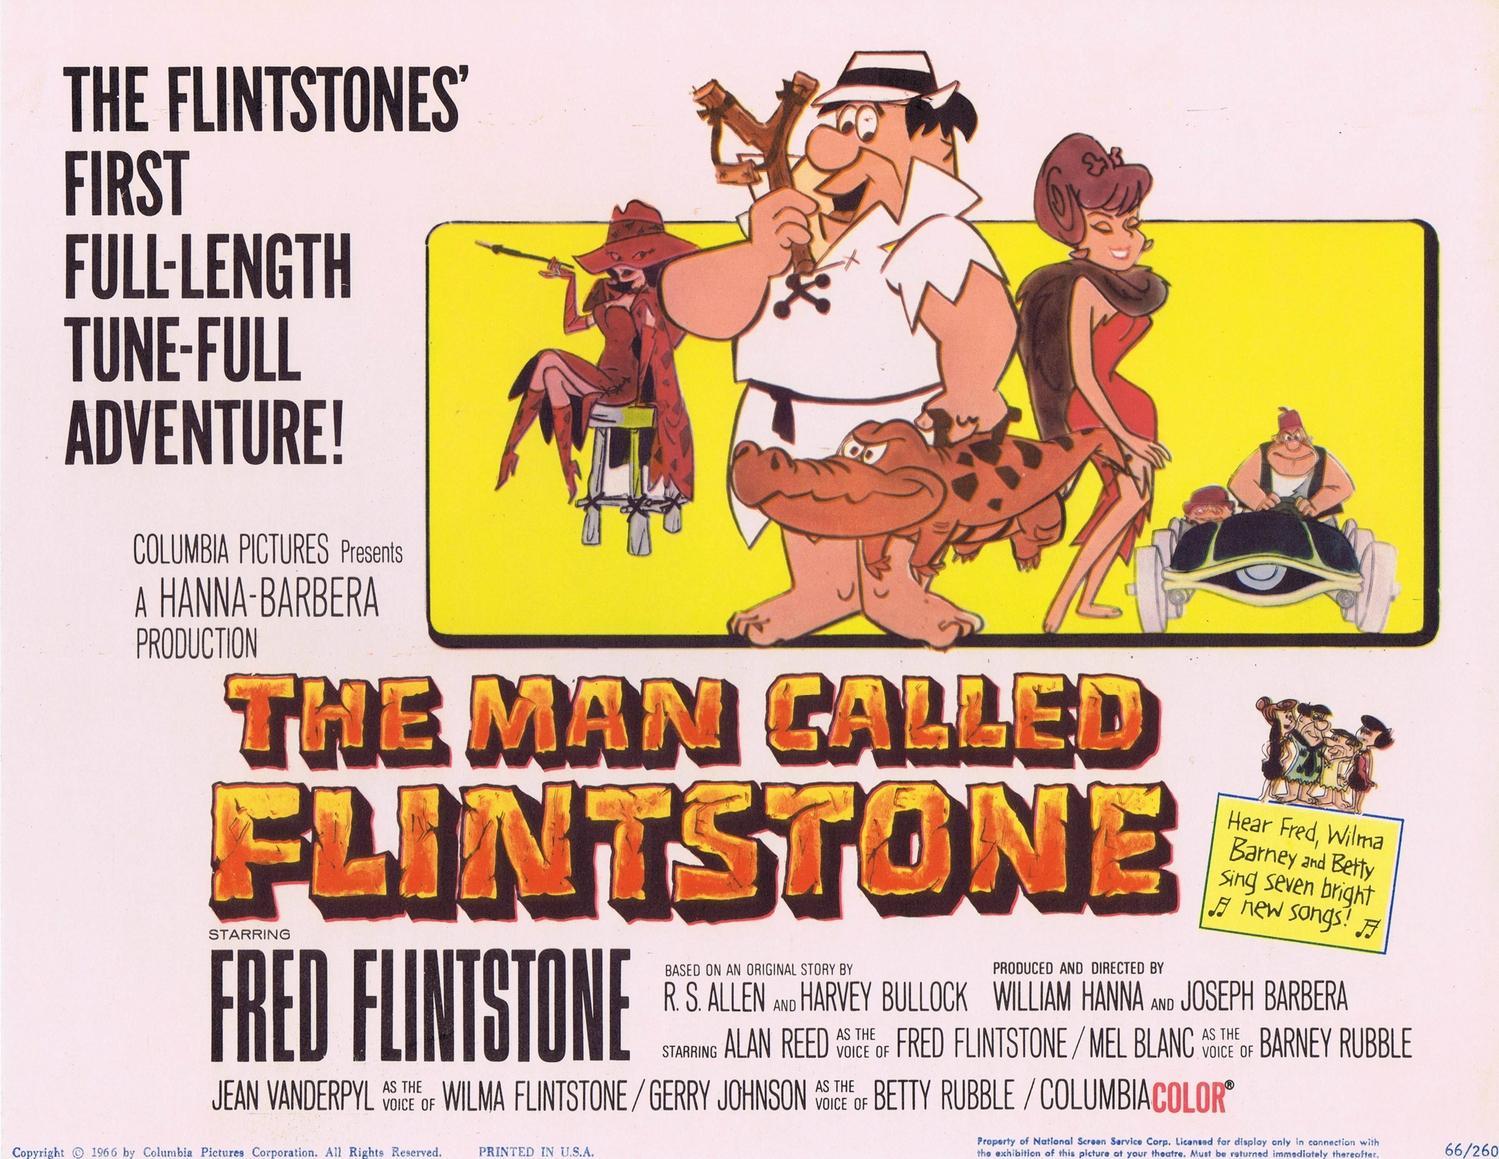 watch a man called flintstone online